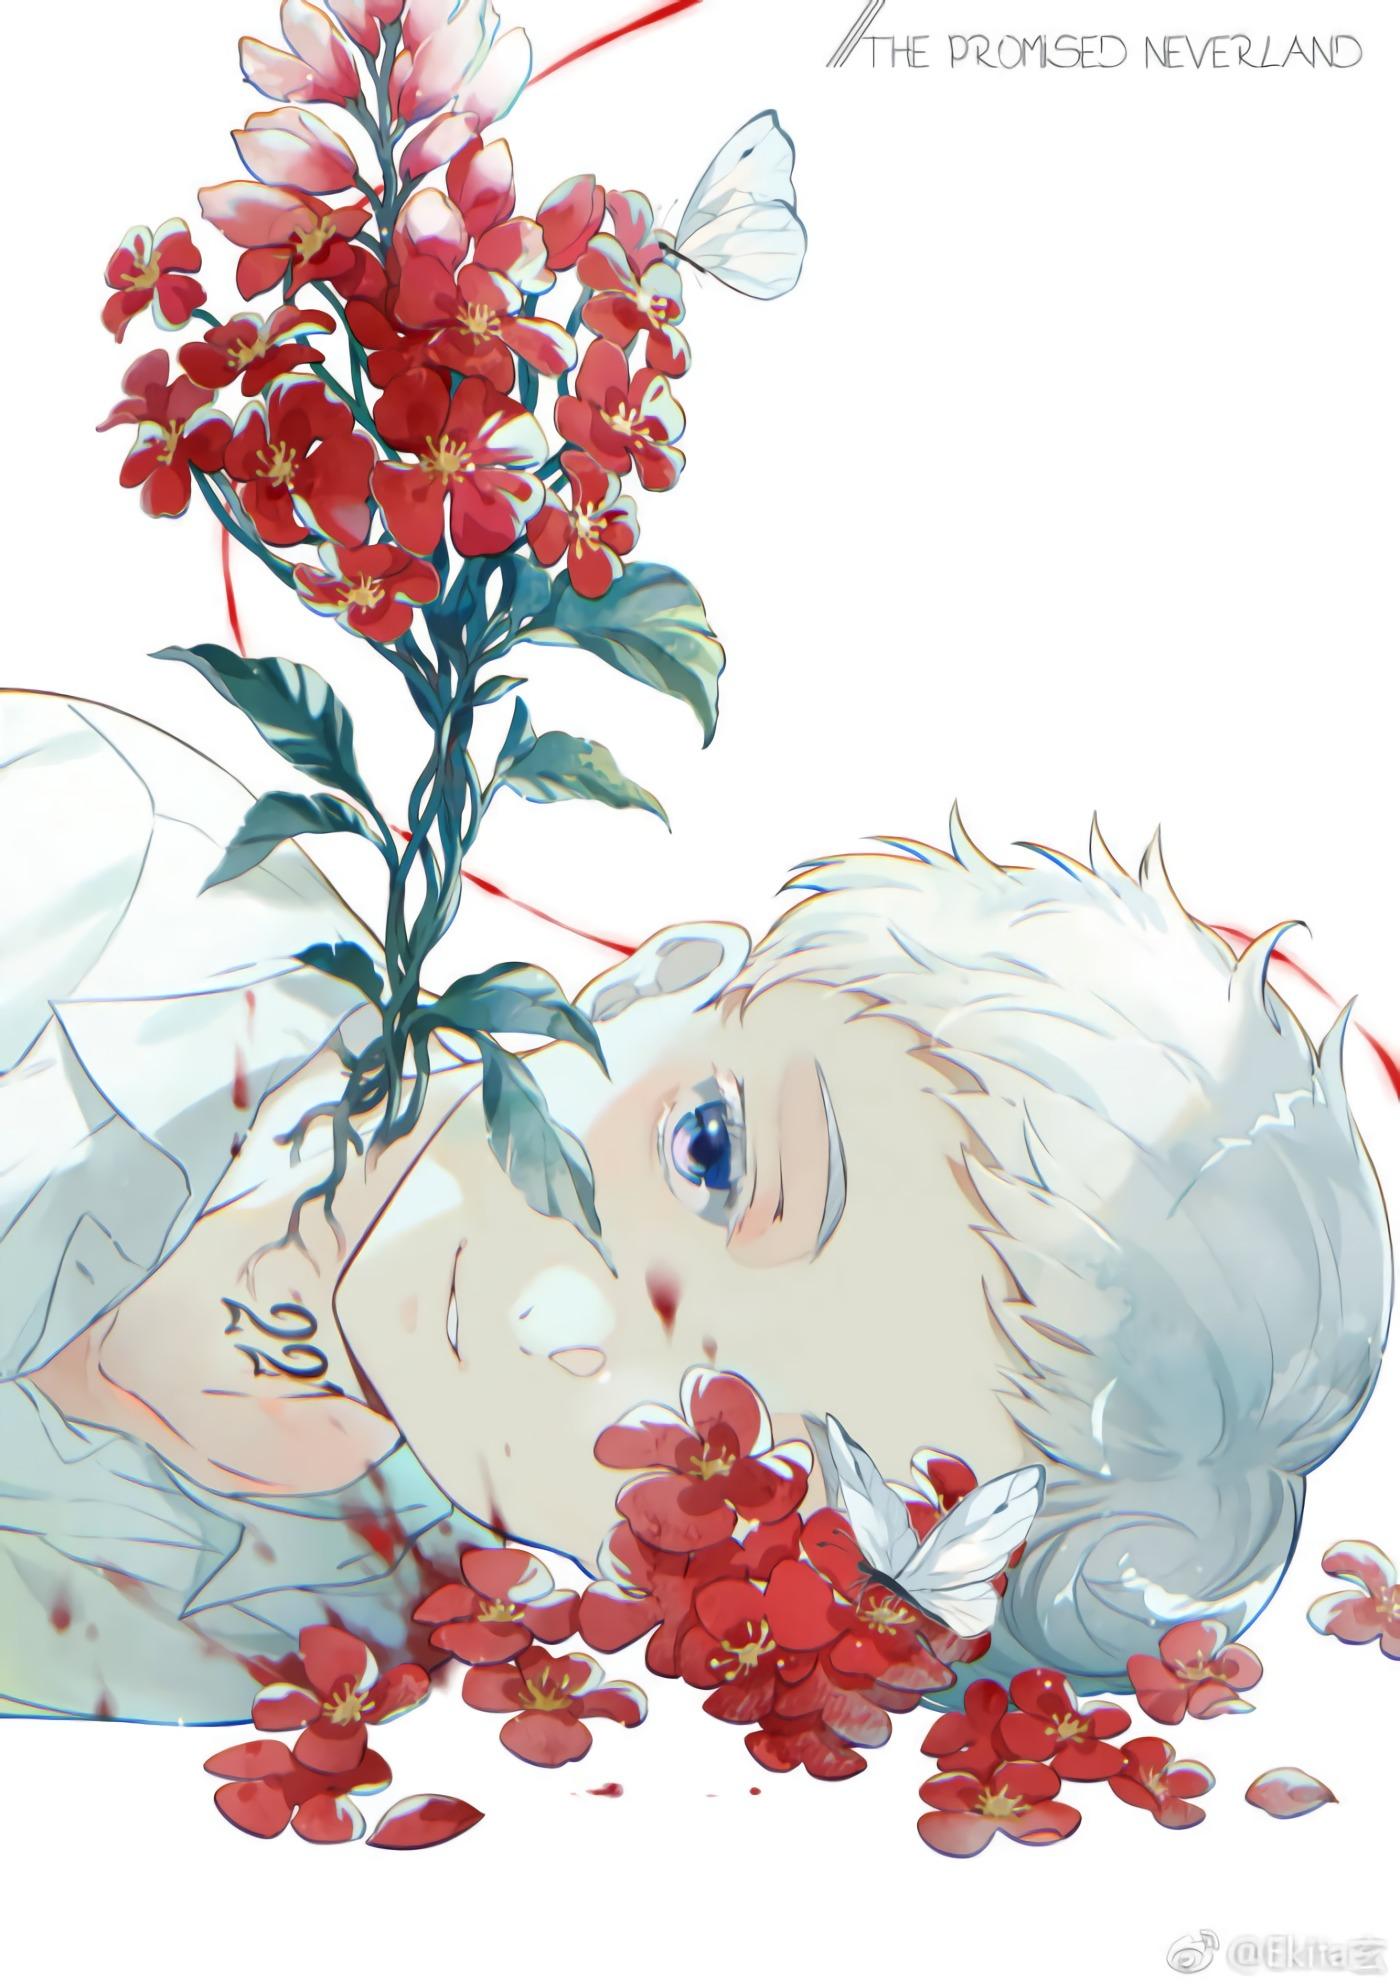 Wallpaper Yakusoku No Neverland Anime Boys Norman The Promised